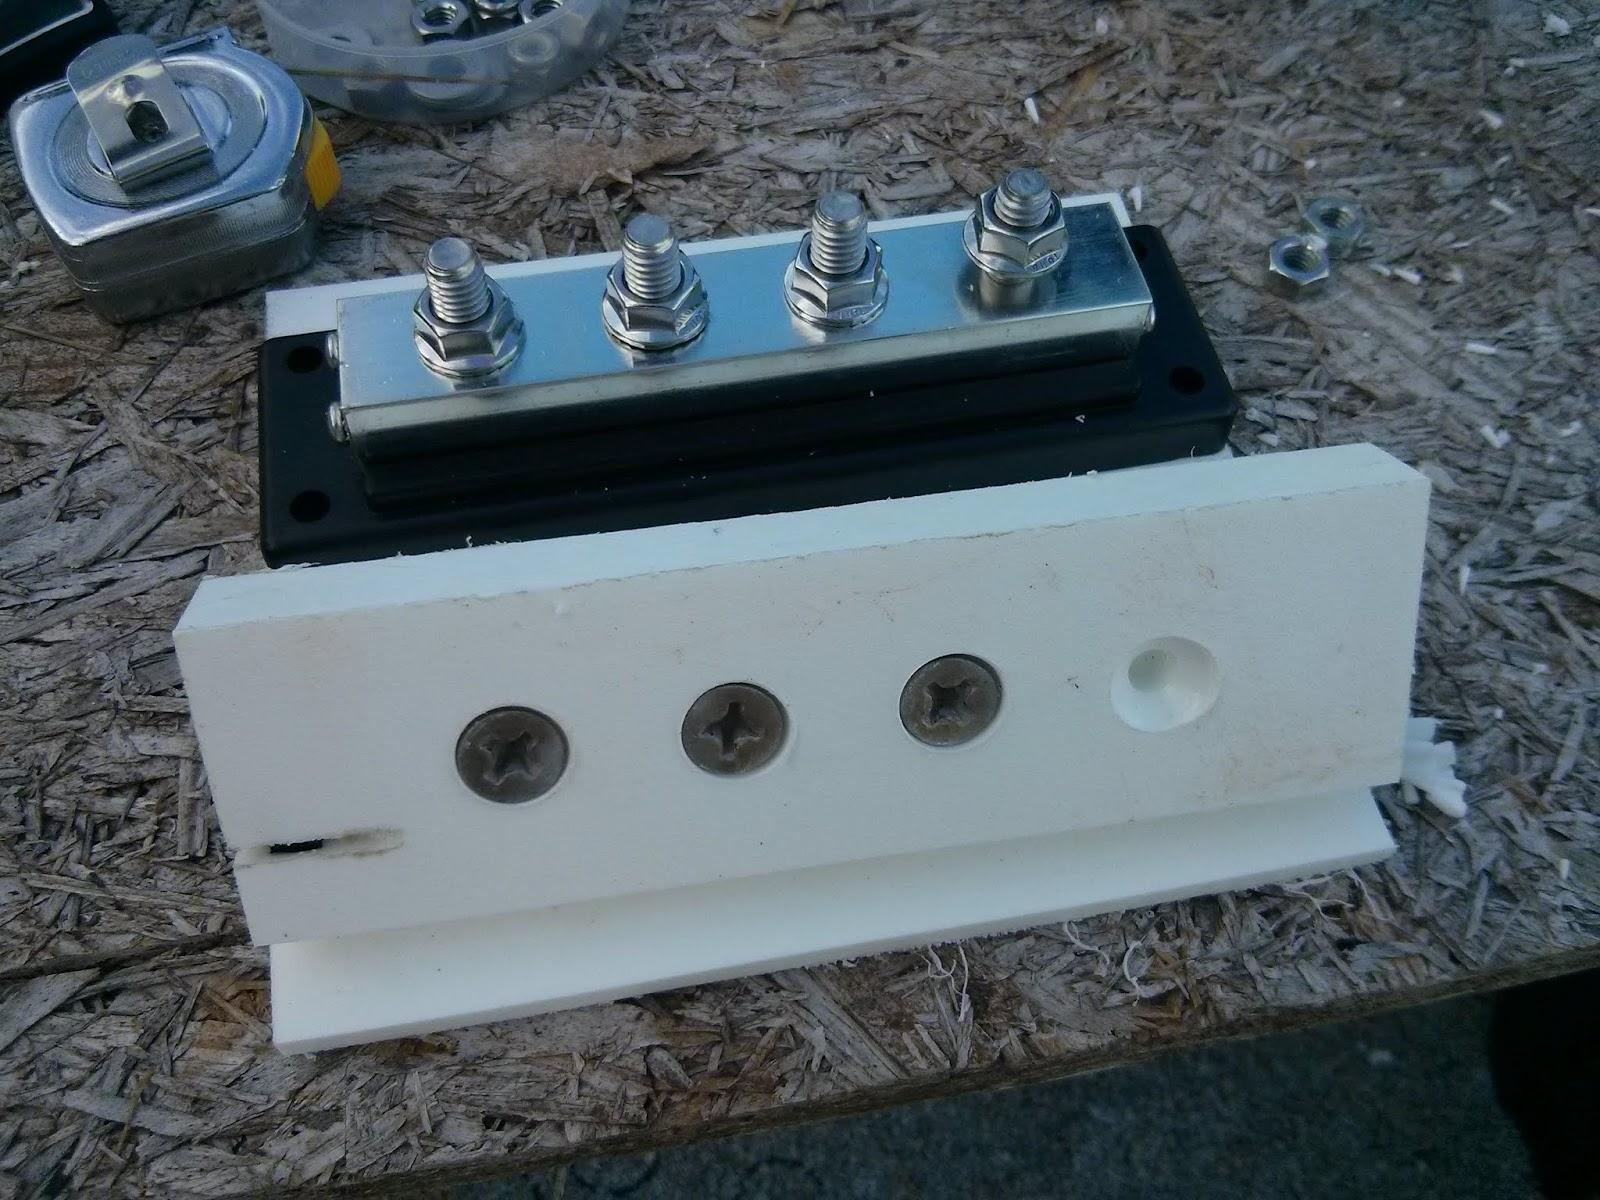 medium resolution of wrg 8370 homemade fuse box for boathomemade fuse box for boat